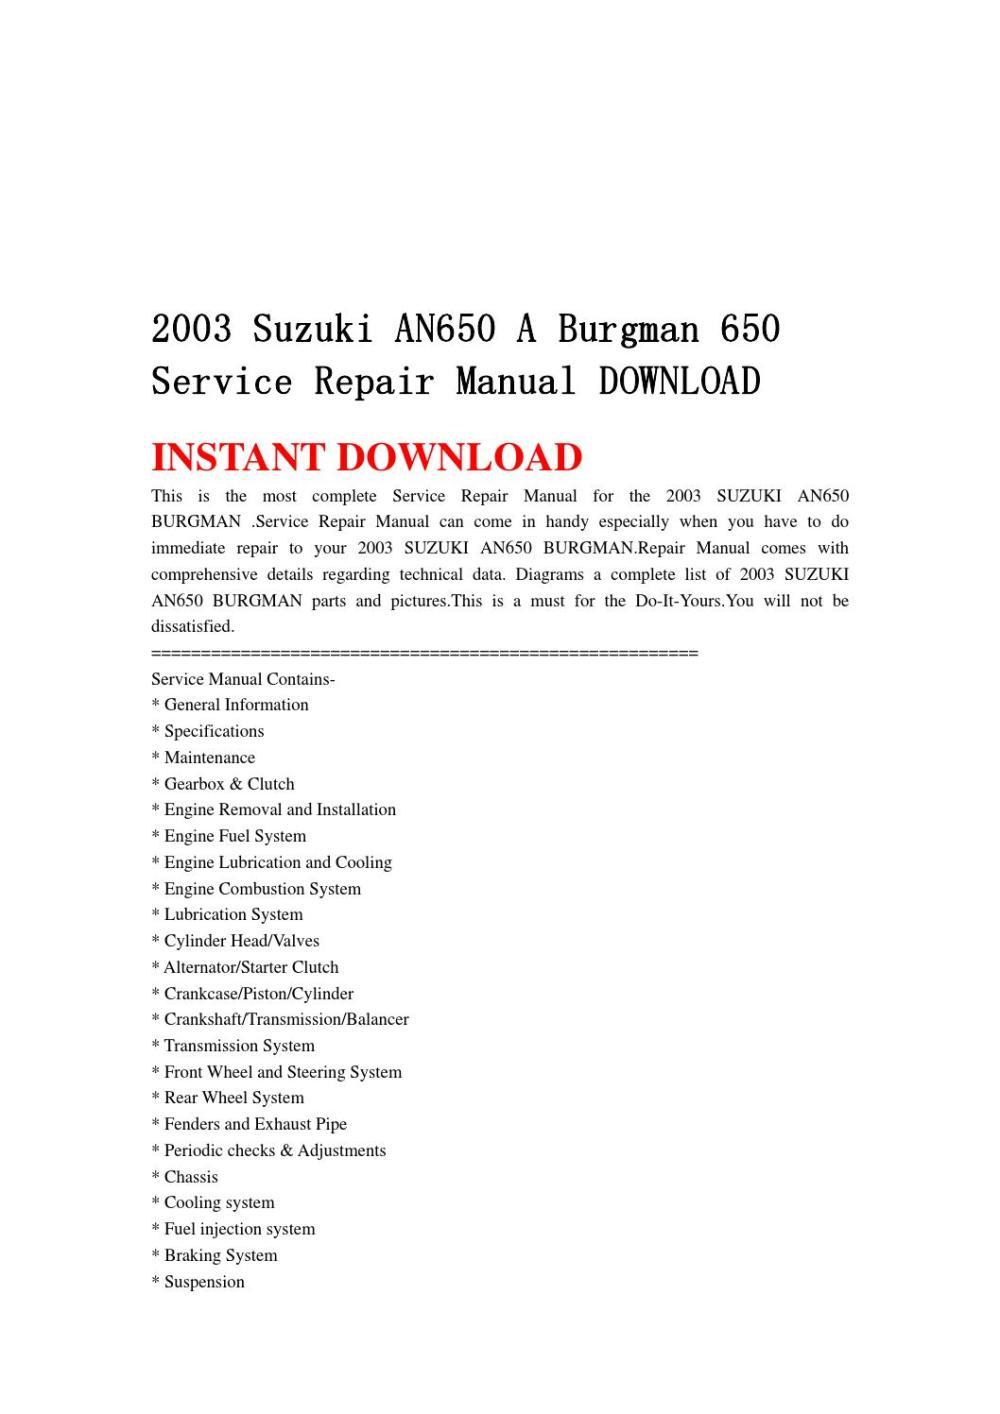 medium resolution of 2003 suzuki an650 a burgman 650 service repair manual download by ksjefkmsef87 issuu